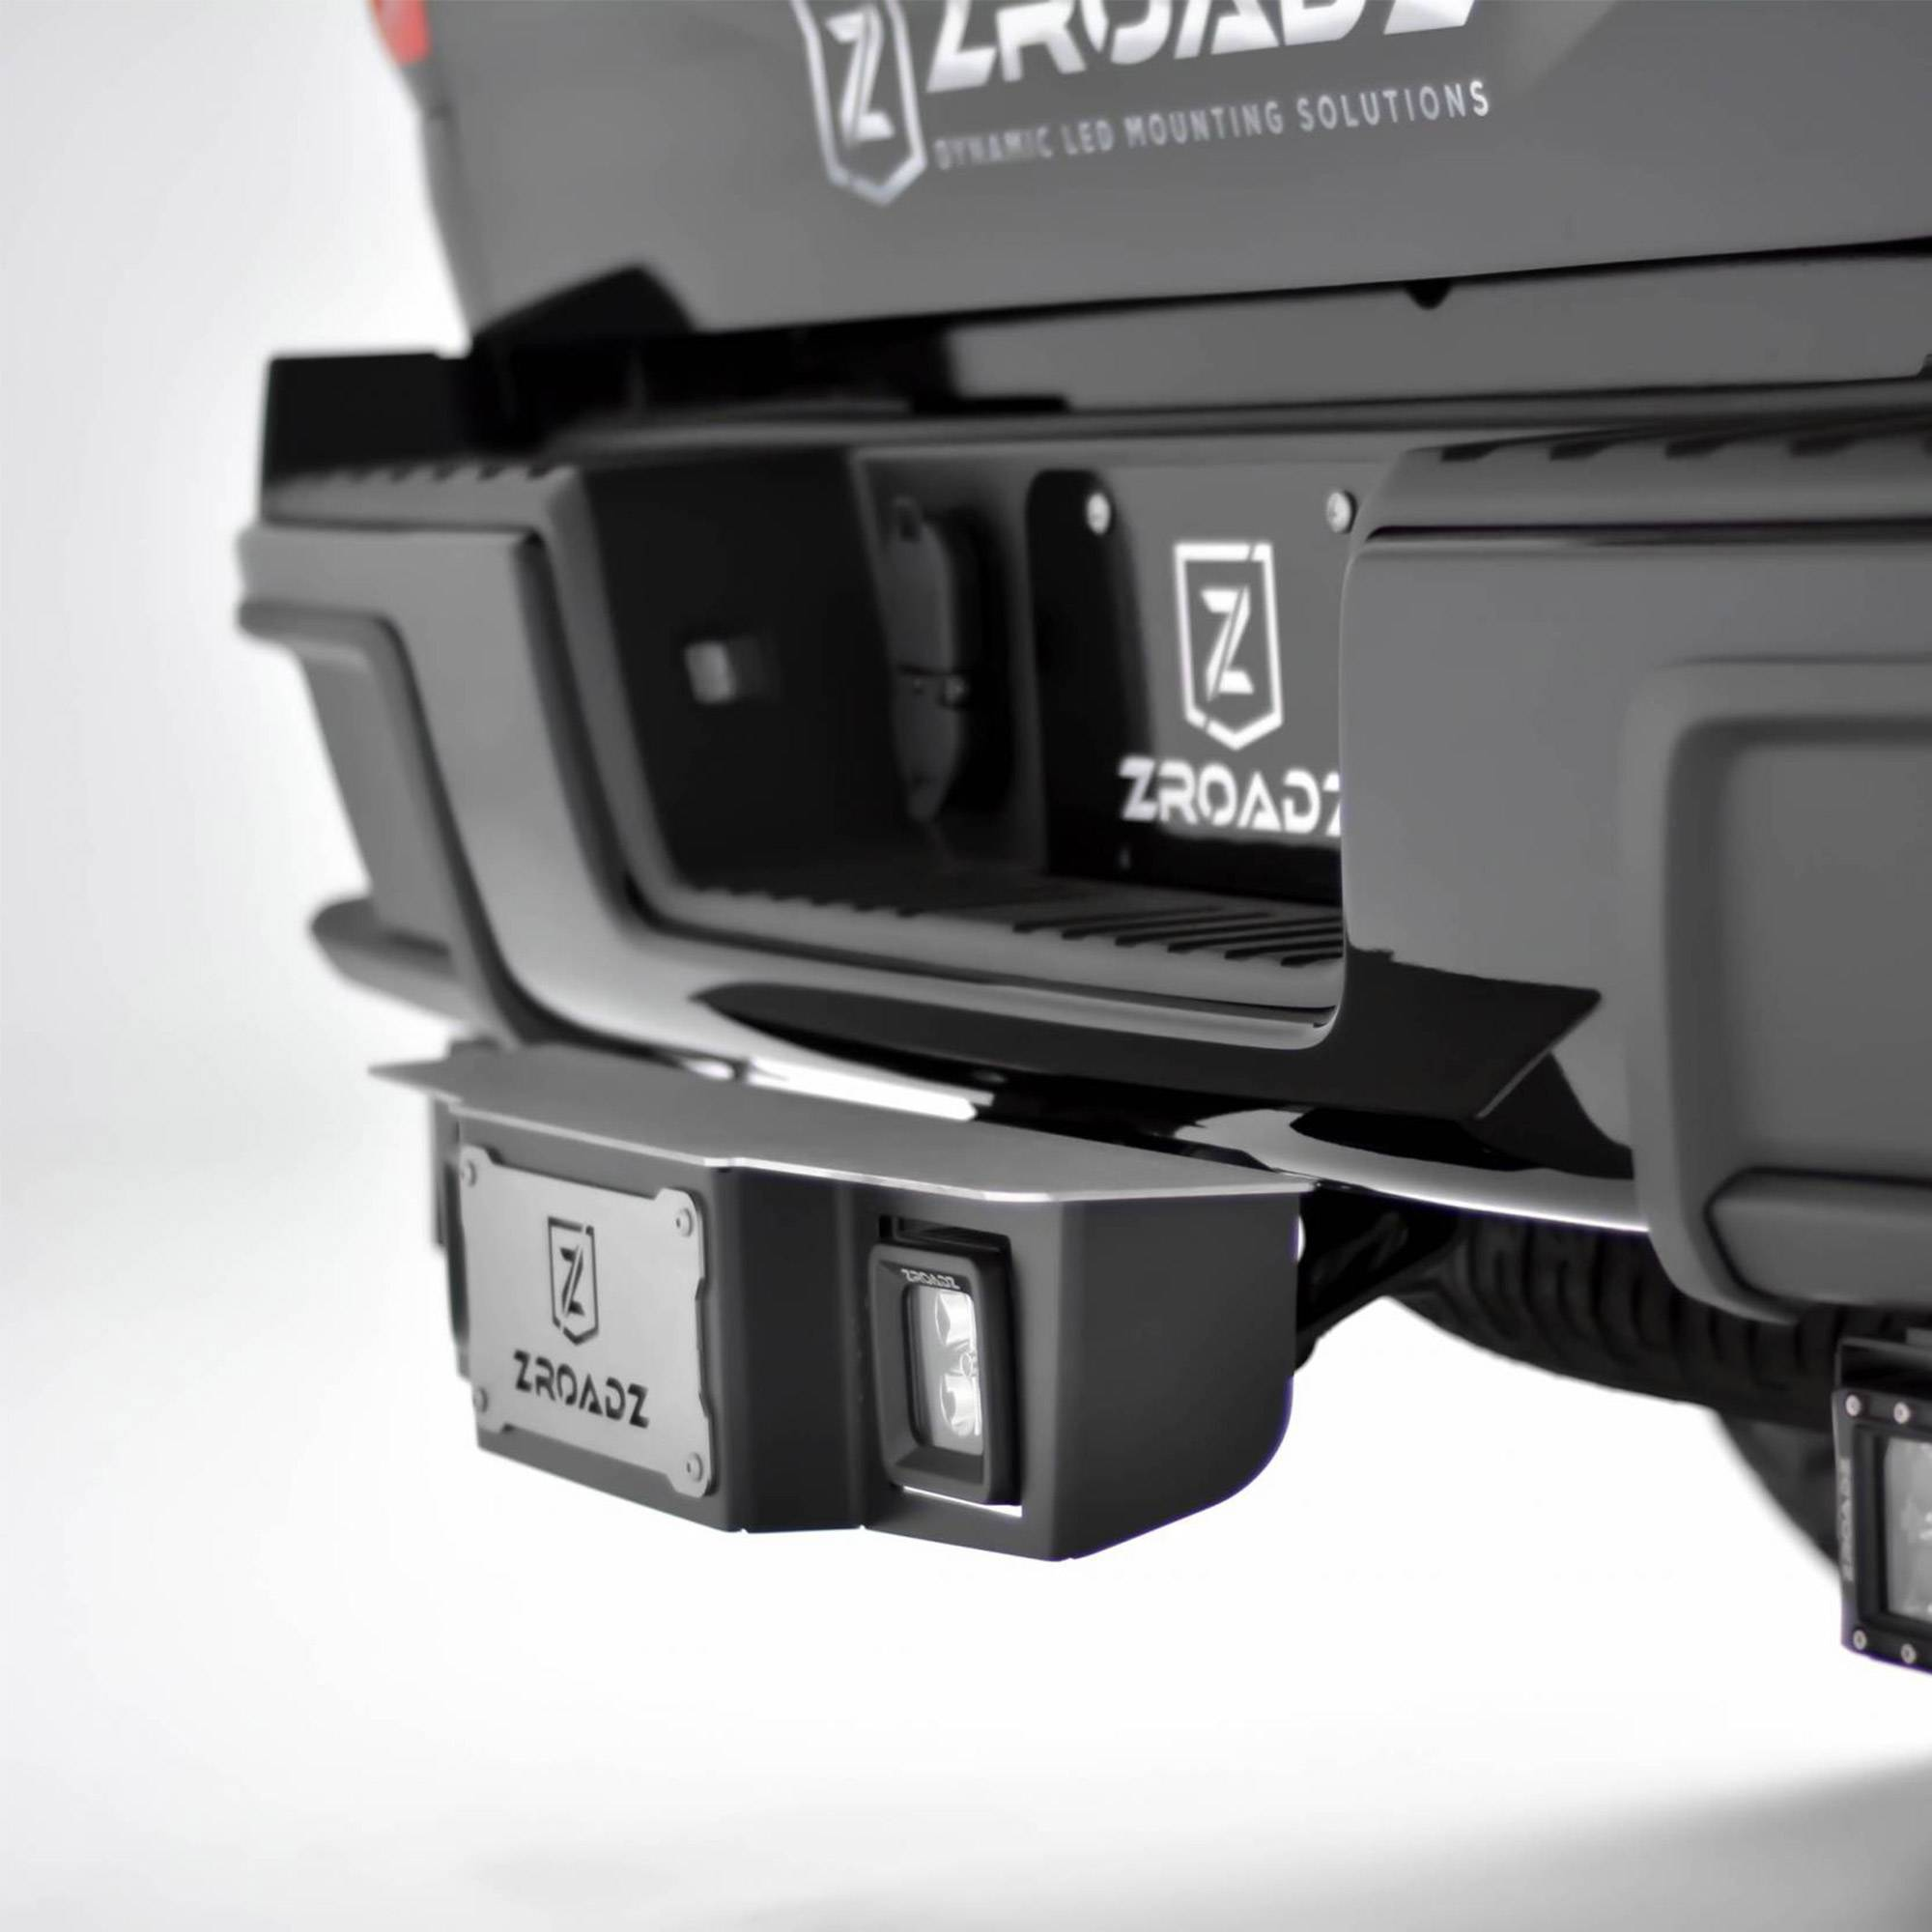 ZROADZ                                             - Universal Hitch Step LED Kit with (2) 3 Inch LED Pod Lights, Fits 2 Inch Receiver  - PN #Z390010-KIT